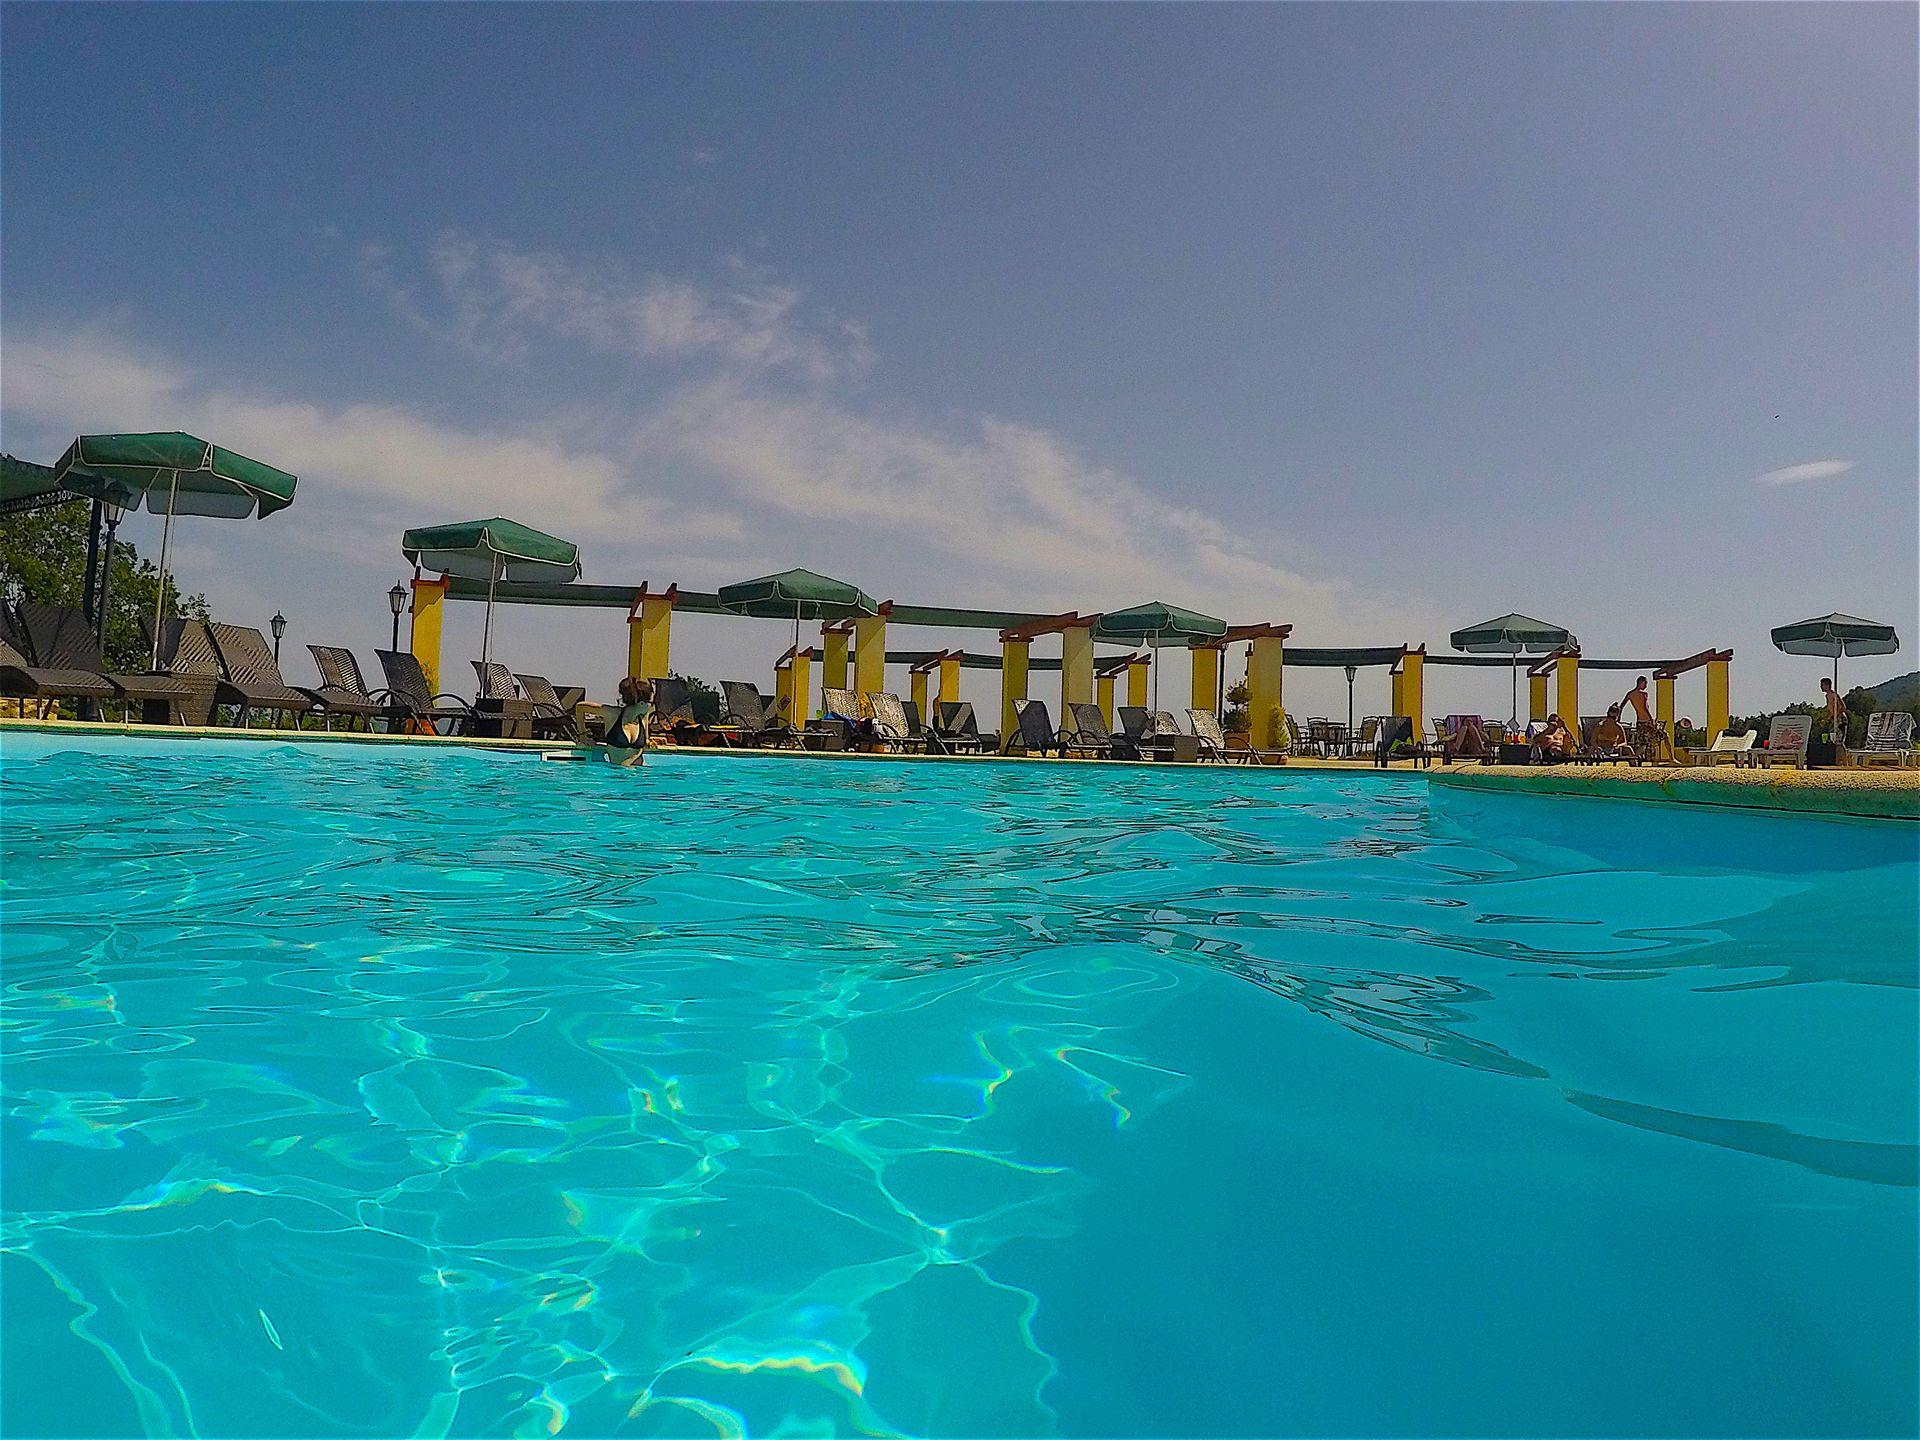 Loggas Hotel Kastoria - Καστοριά ? 2 Ημέρες (1 Διανυκτέρευση) ? 2 Άτομα ΚΑΙ ένα Παιδί έως 4 ετών ? Πρωινό ? έως 30/09/2018 ? Υπέροχη Τοποθεσία!